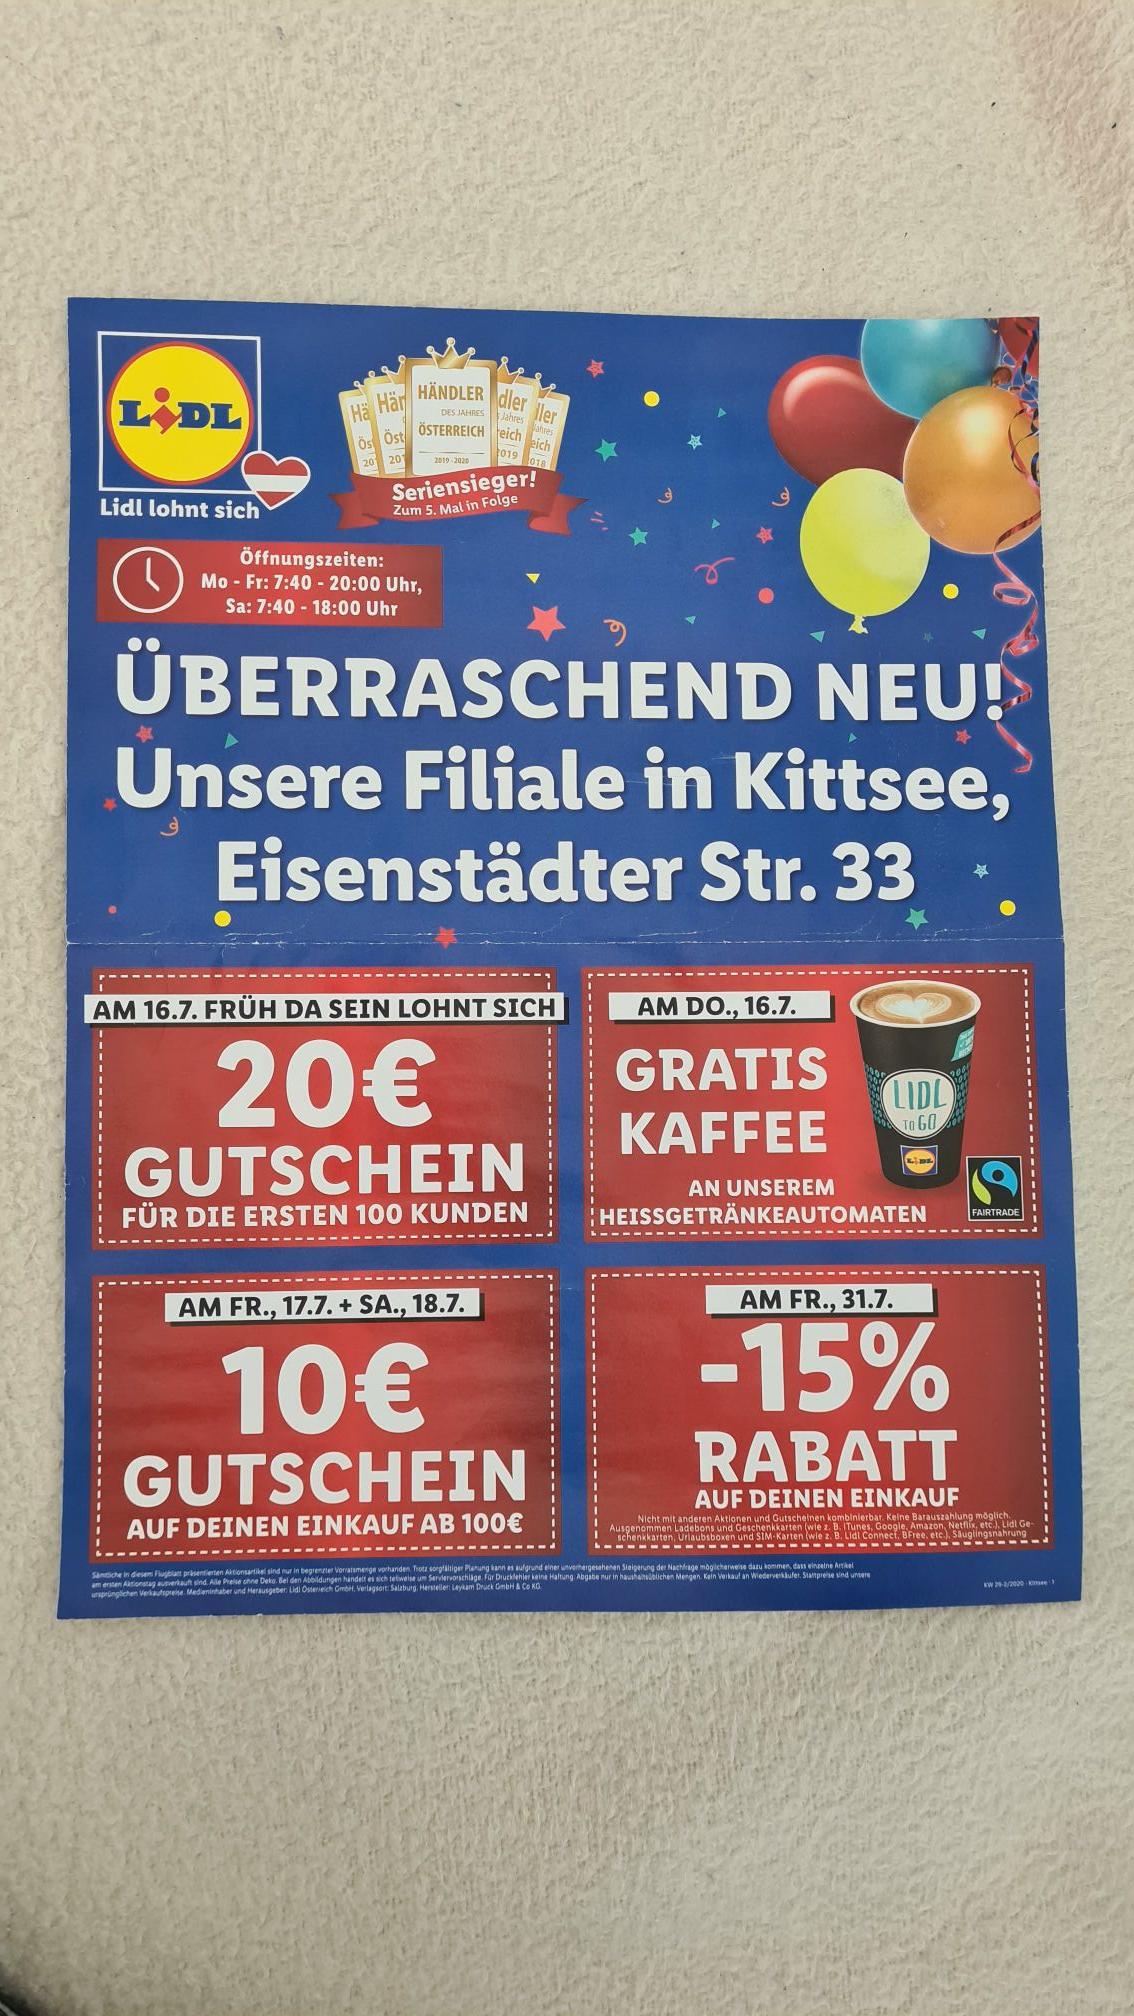 Lidl in Mödling / Graz (Koßgasse) / Kittsee / Götzis: 15% Rabatt am 31.7.